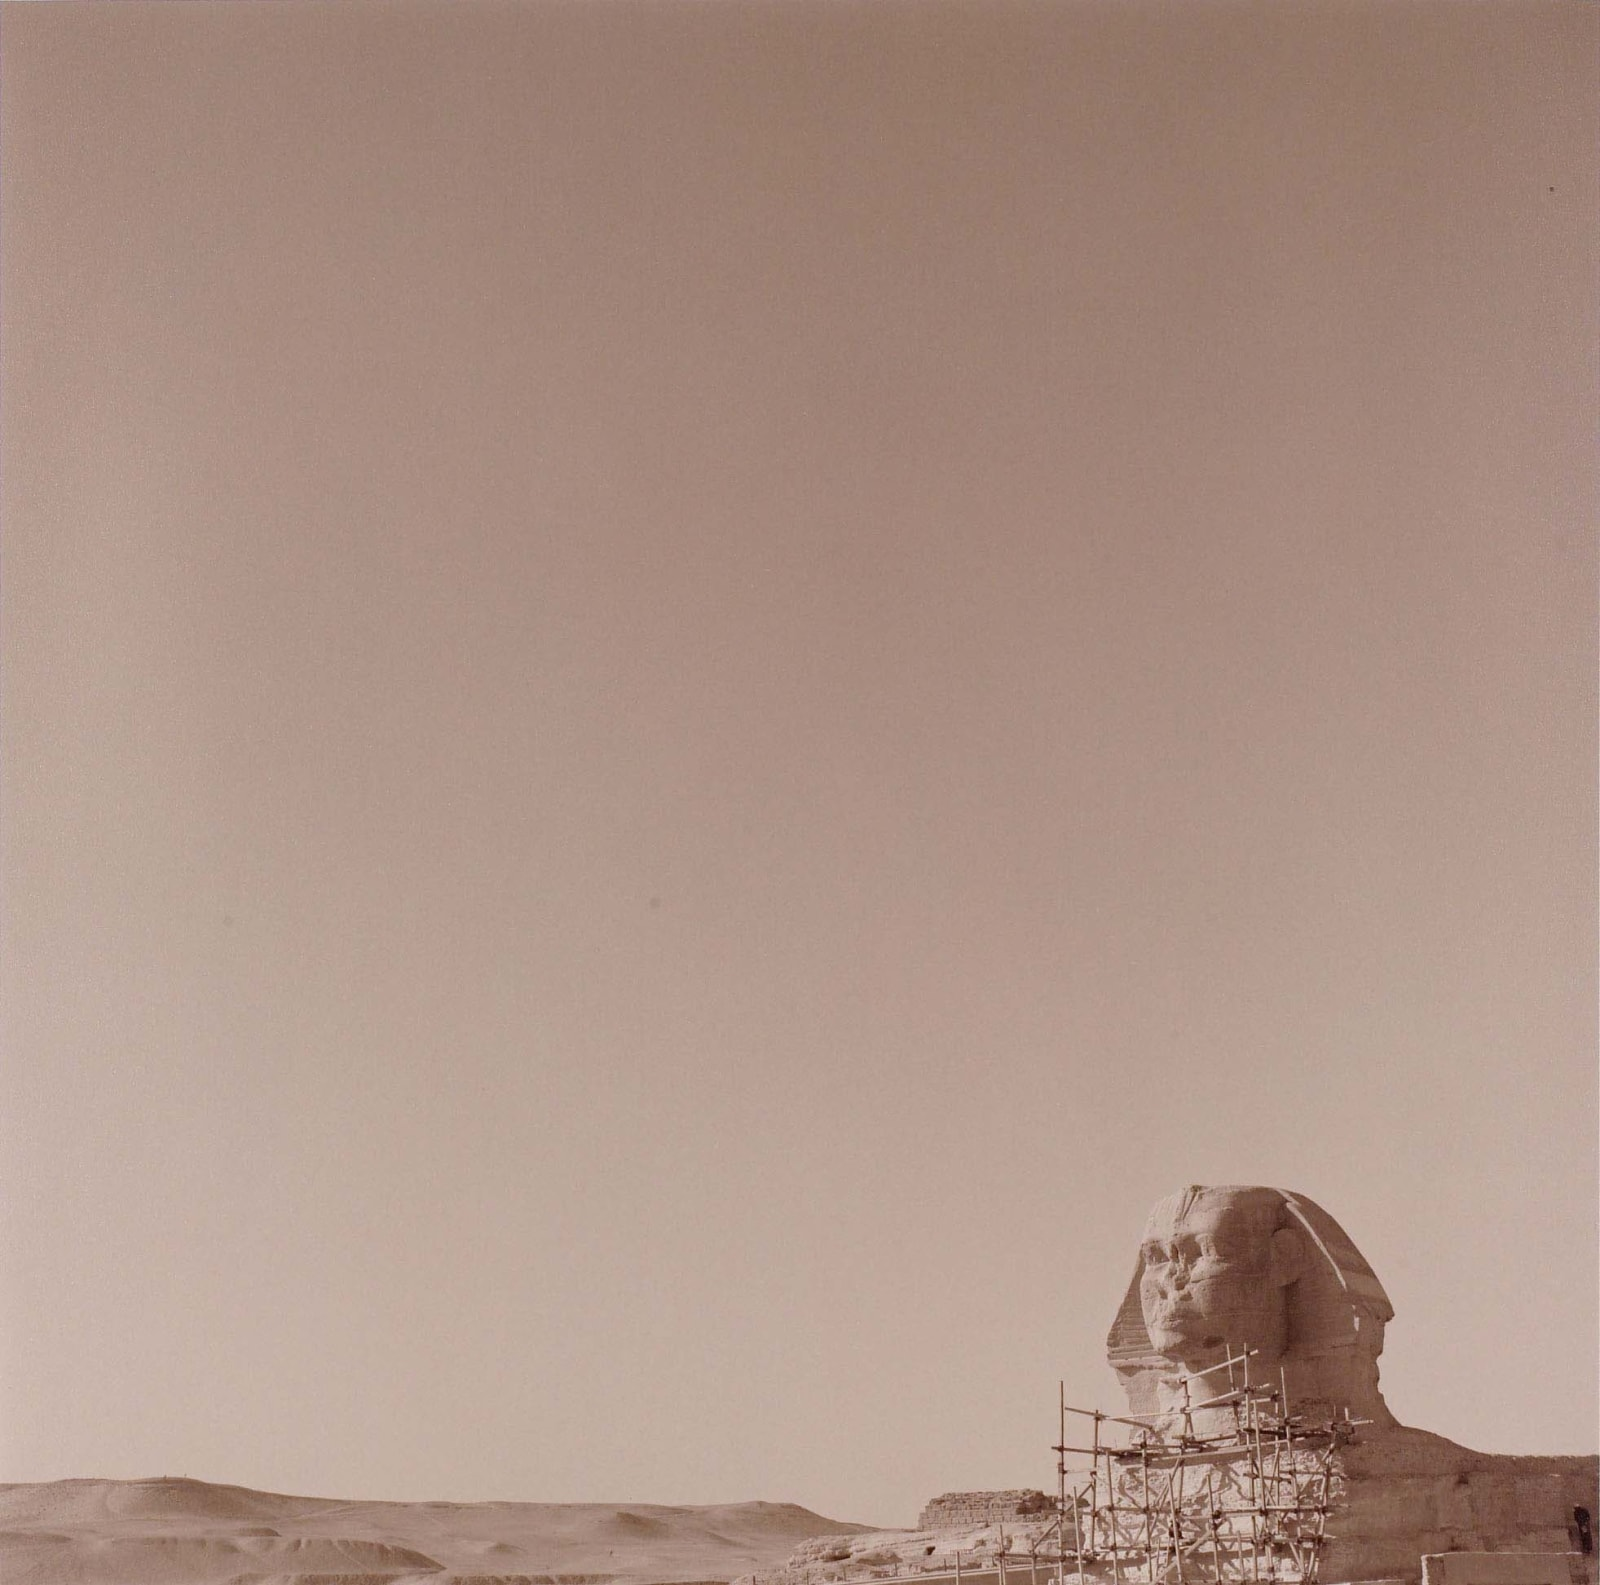 Lynn Davis photograph of Sphinx at Memphis, Egypt in lower right hand corner